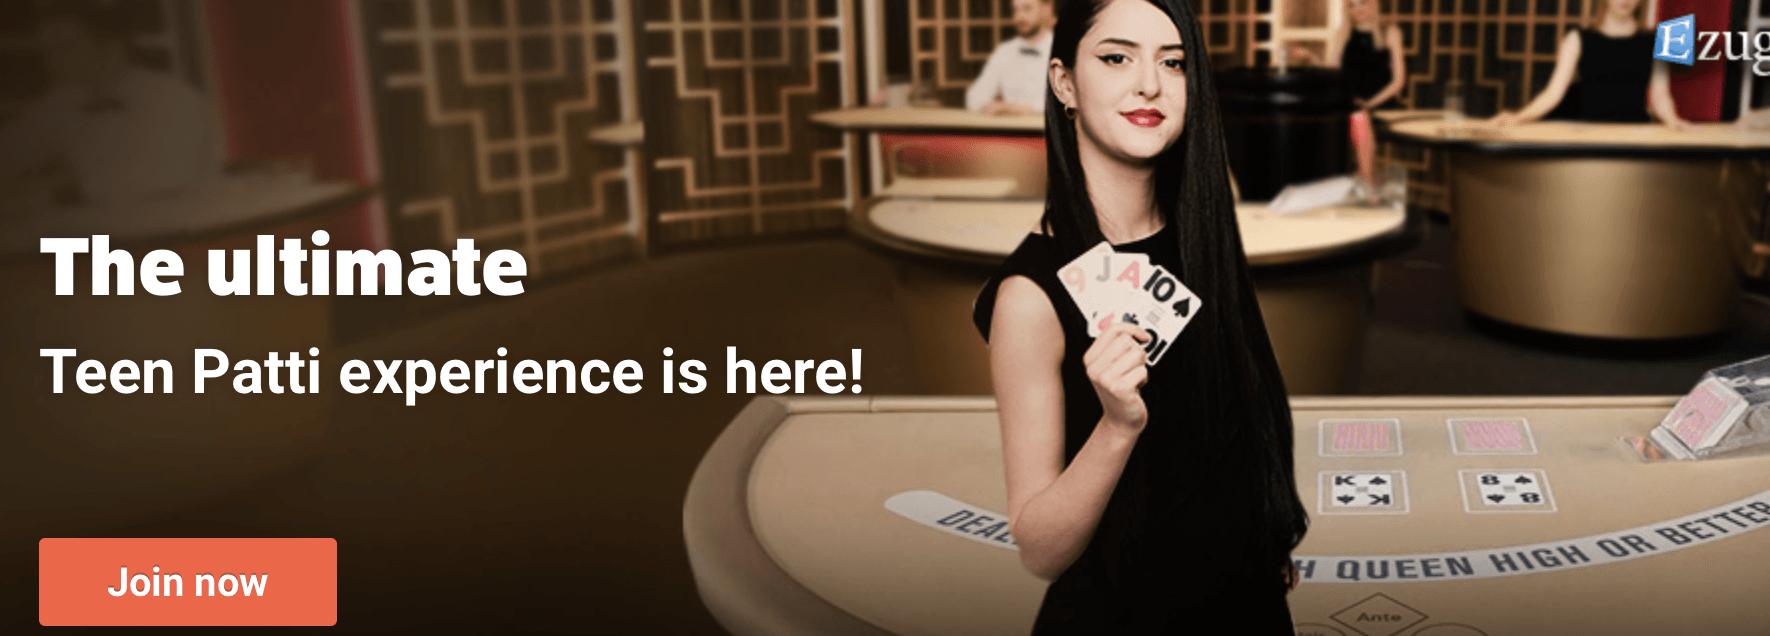 LeoVegas India Casino | Indias No 1 Award Winning Mobile Casino